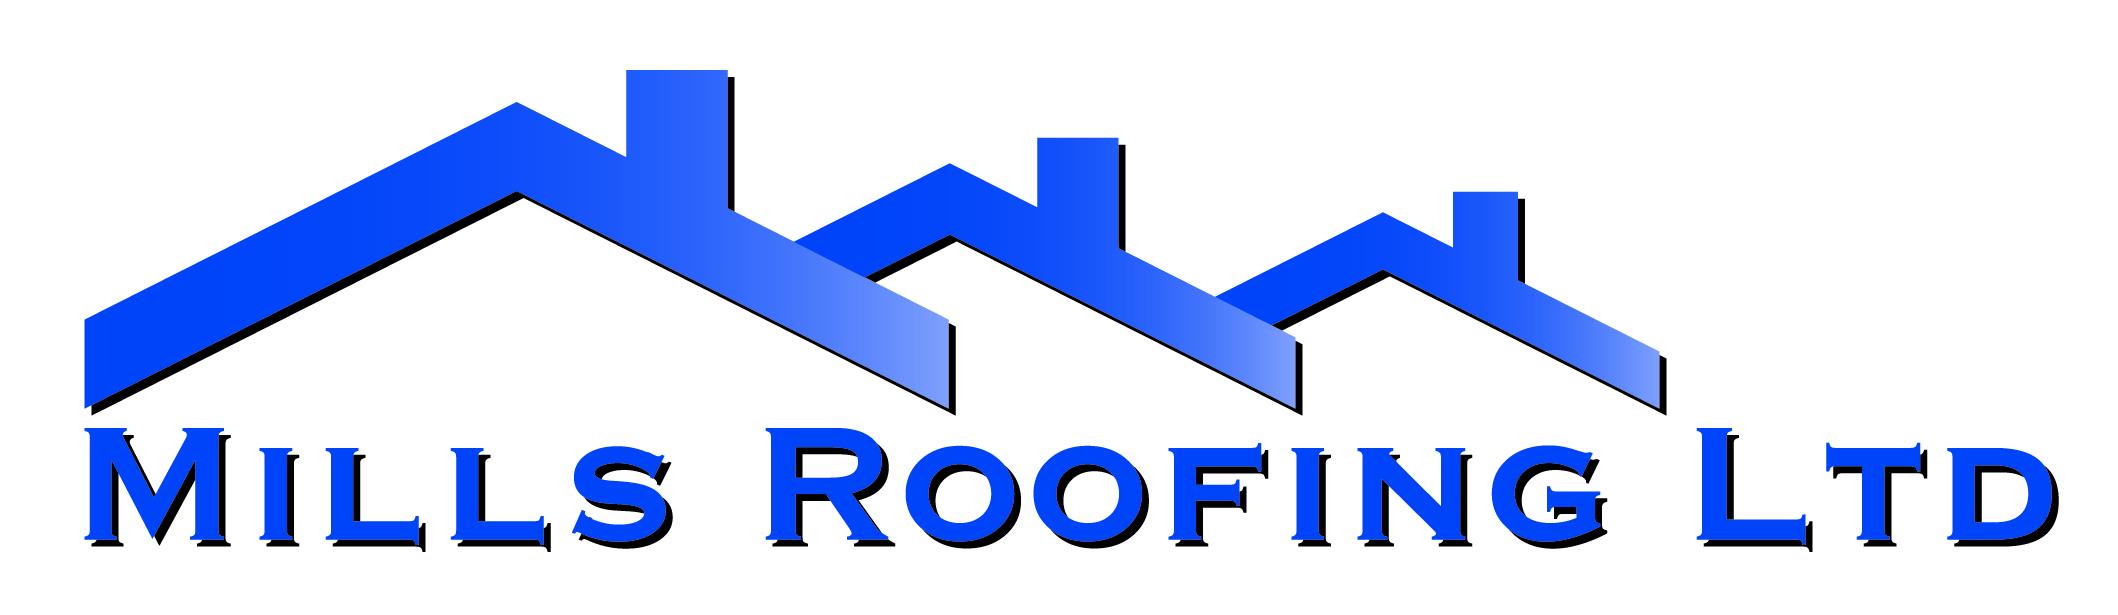 Mills_Roofing_Ltd-Logo